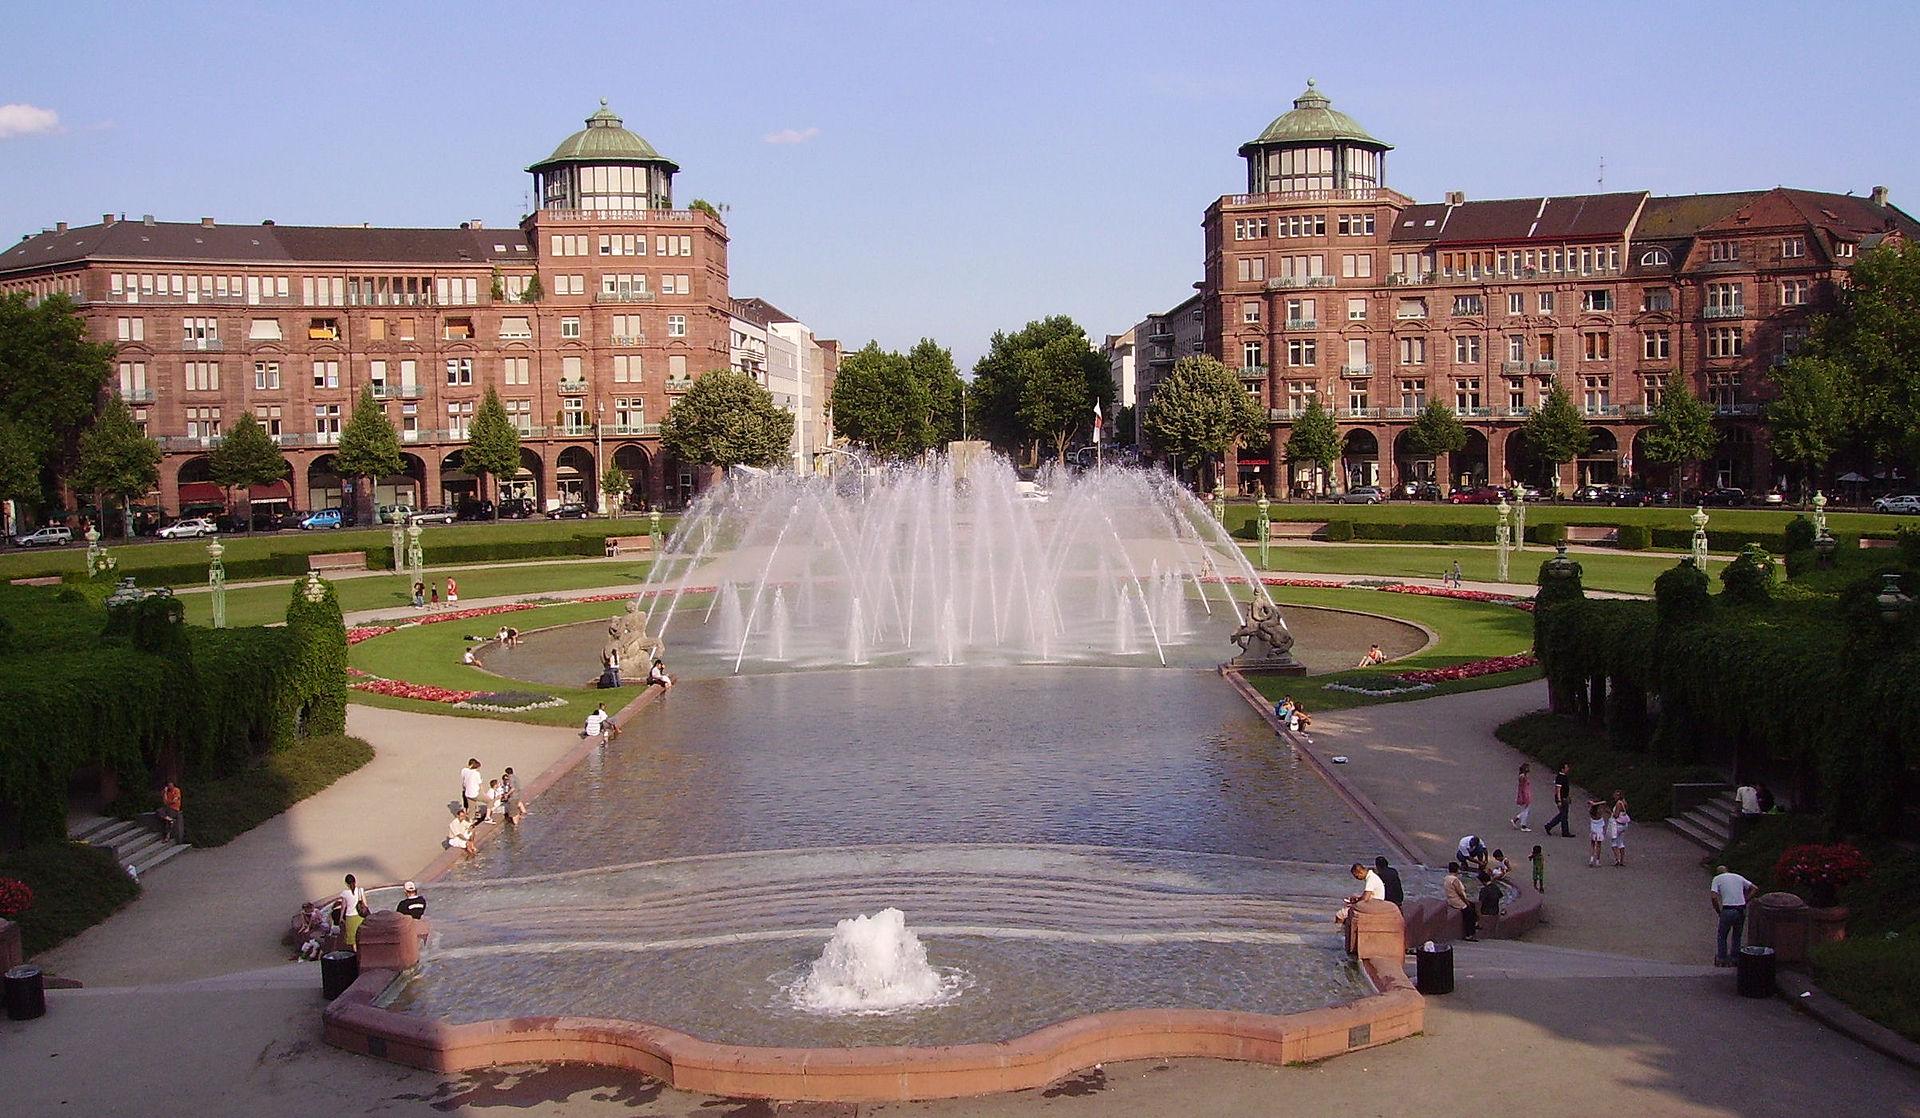 Bild Arkadenbauten Mannheim